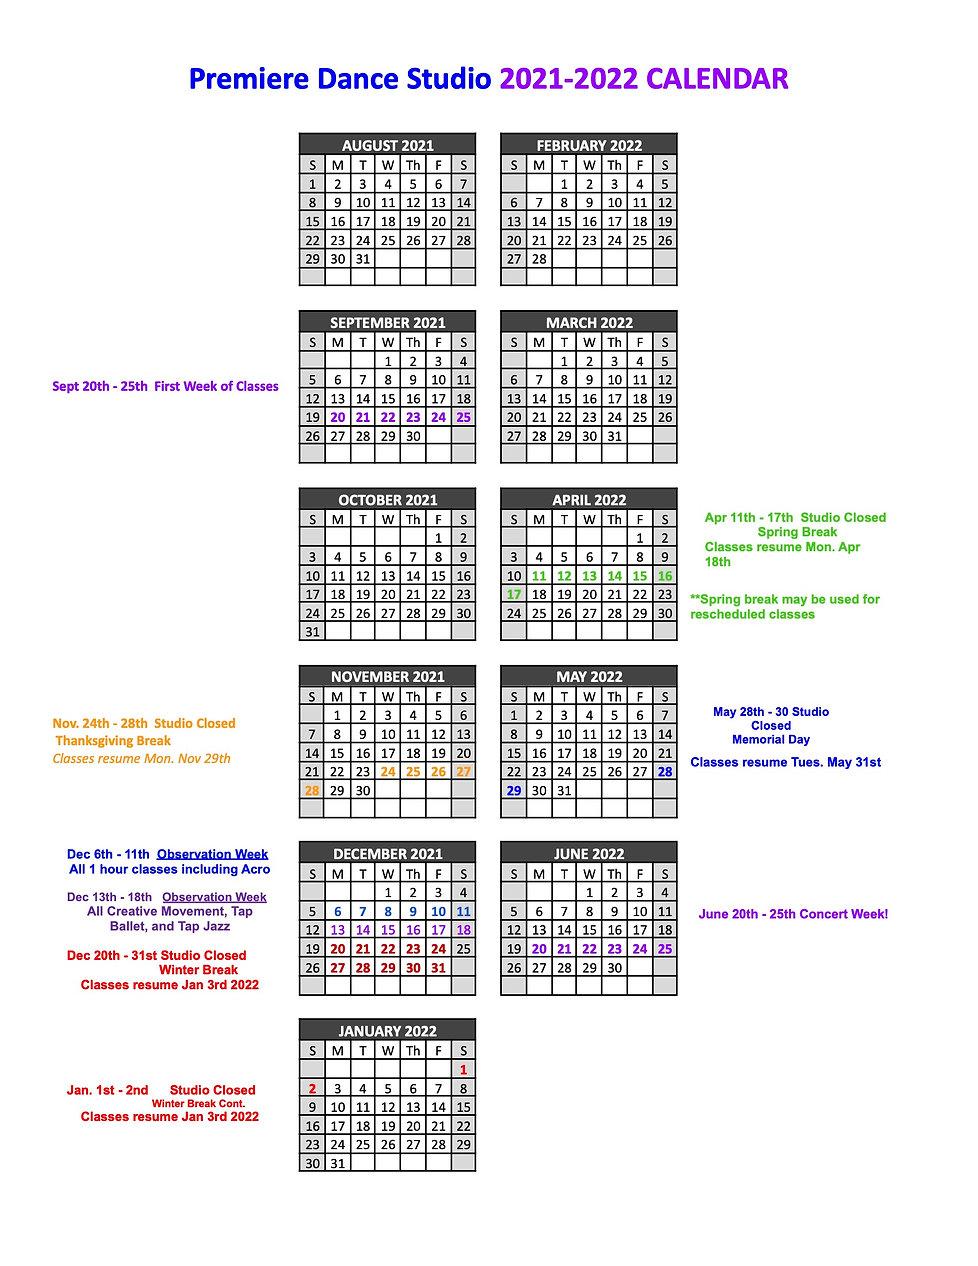 PDS 2021-2022 Calendar.jpg